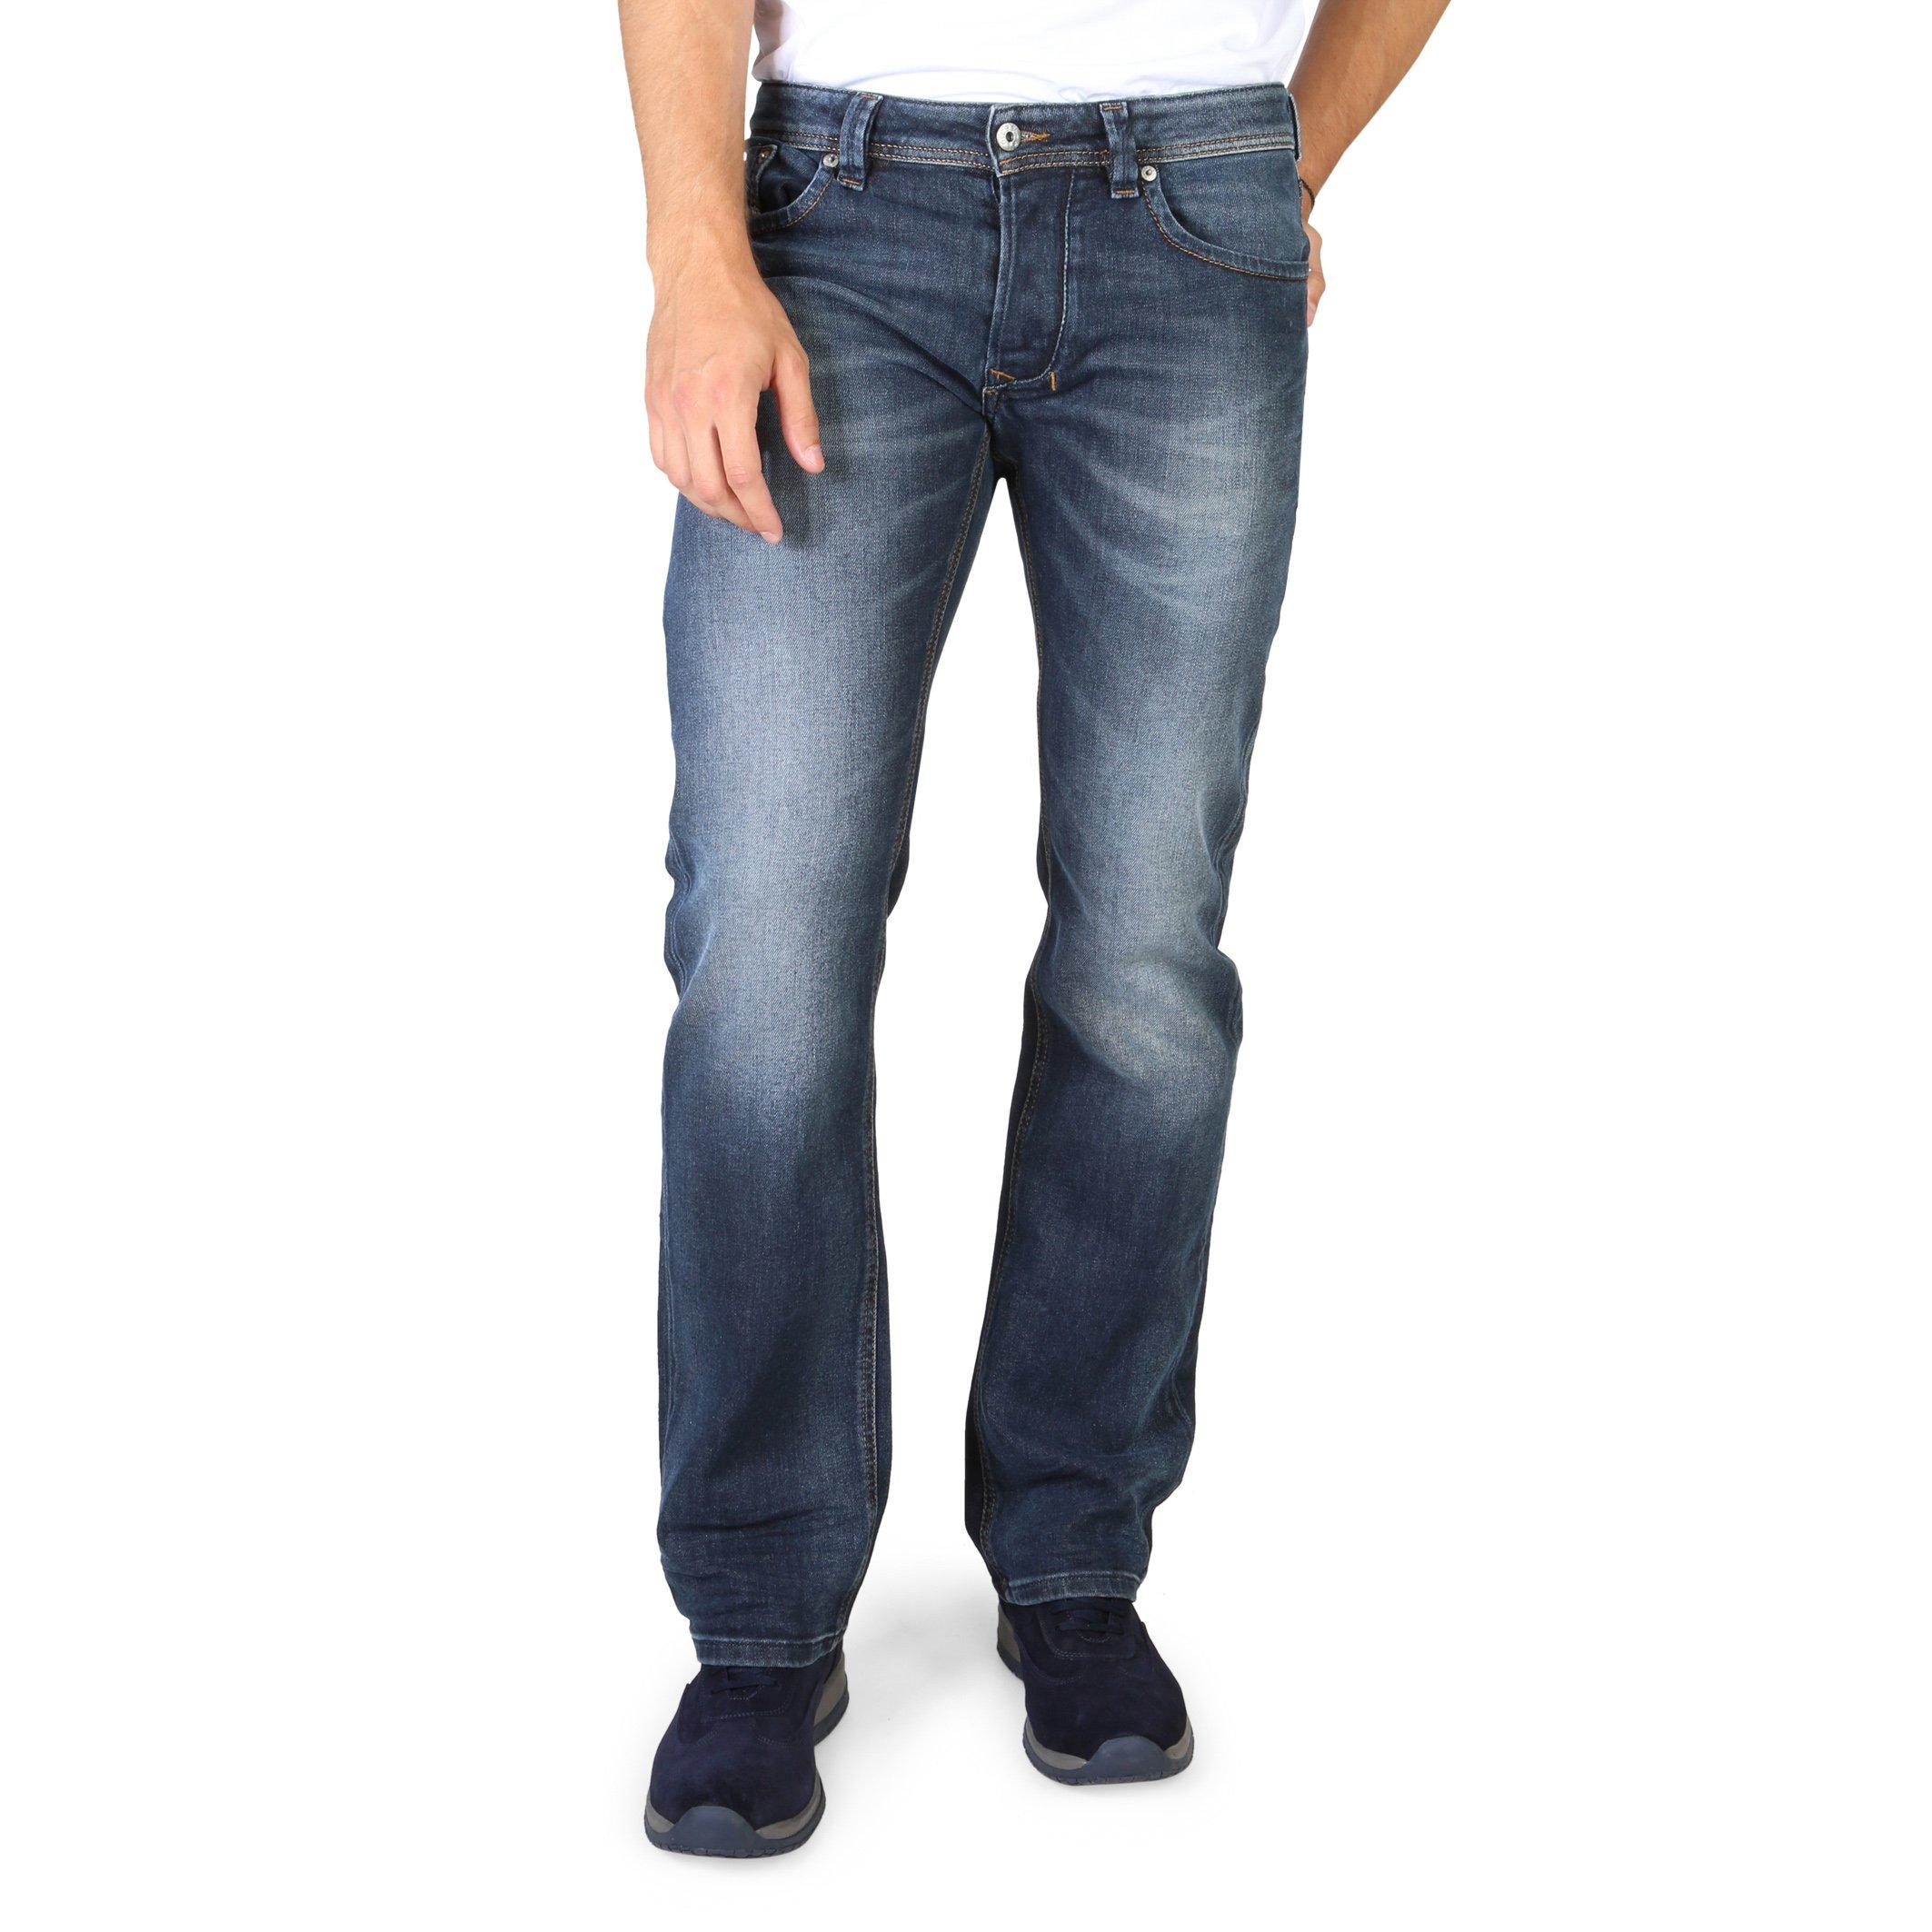 Diesel Men's Jeans Blue LARKEE_L32 - blue-1 29